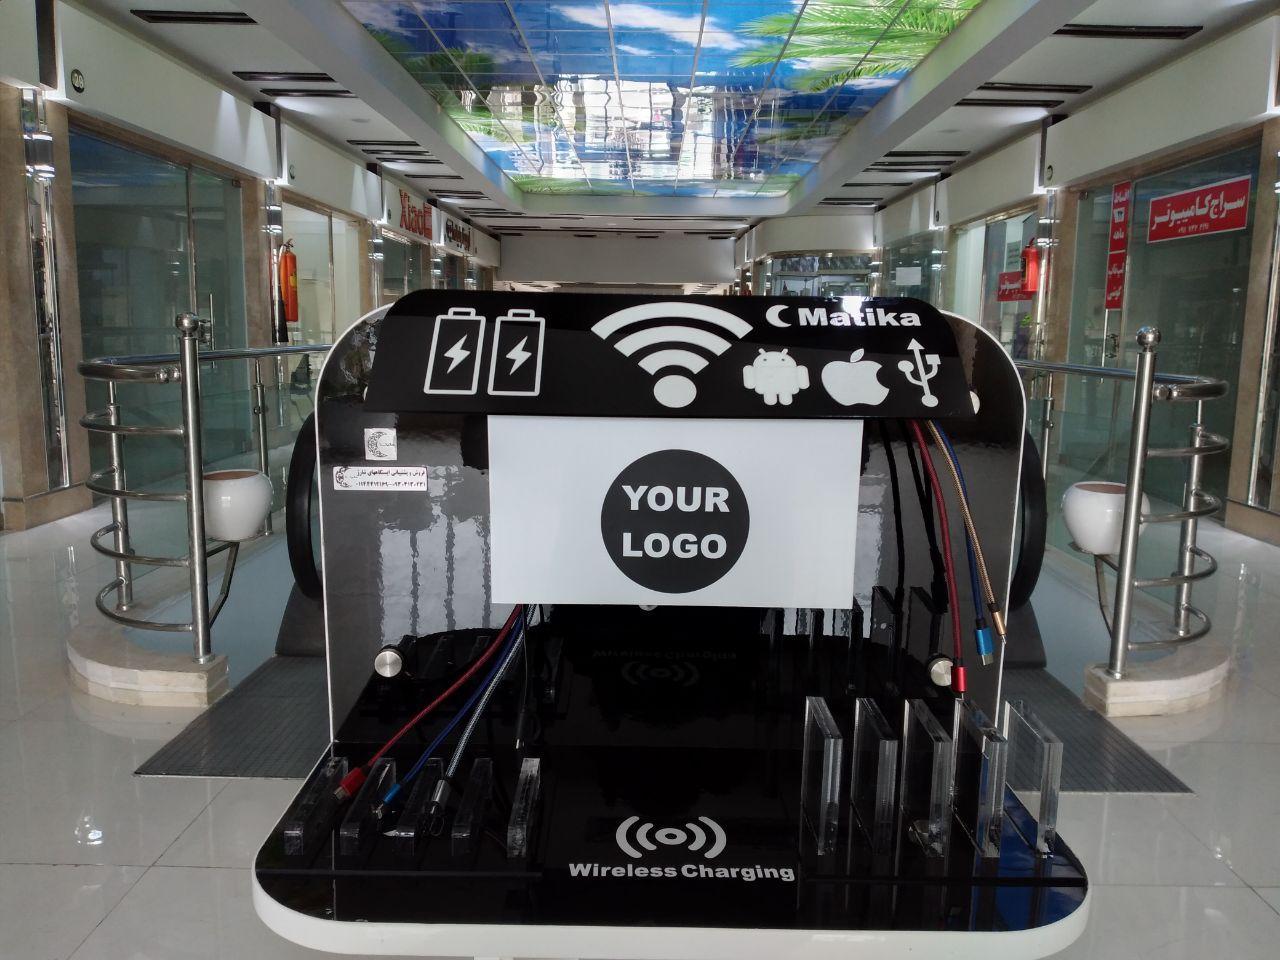 استند شارژر موبایل – استند شارژ موبایل - استند شارژ - ایستگاه شارژ موبایل - شارژر موبایل - شارژر اماکن عمومی - شارژرهای عمومی - شارژر موبایل اماکن عمومی - شارژر وایرلس - شارژر بی سیم – ایستگاه شارژ - شارژرهای فست - شارژر رومیزی – استند موبایل – استند عمومی موبایل – شارژر عمومی – تابلو اعلانات – تابلو اطلاعات هوشمند – شارژر چندتایی  Mobile charger stand - Mobile charging stand - Charging stand - Mobile charging station - Mobile charger - Public places charger - General chargers - Mobile charger Public places - Wireless charger - Wireless charger - Starter charging stand - Mobile - Charging - Fast chargers General Mobile - General Charger - Announcement Panel - Smart Information Panel - Multiple Charger